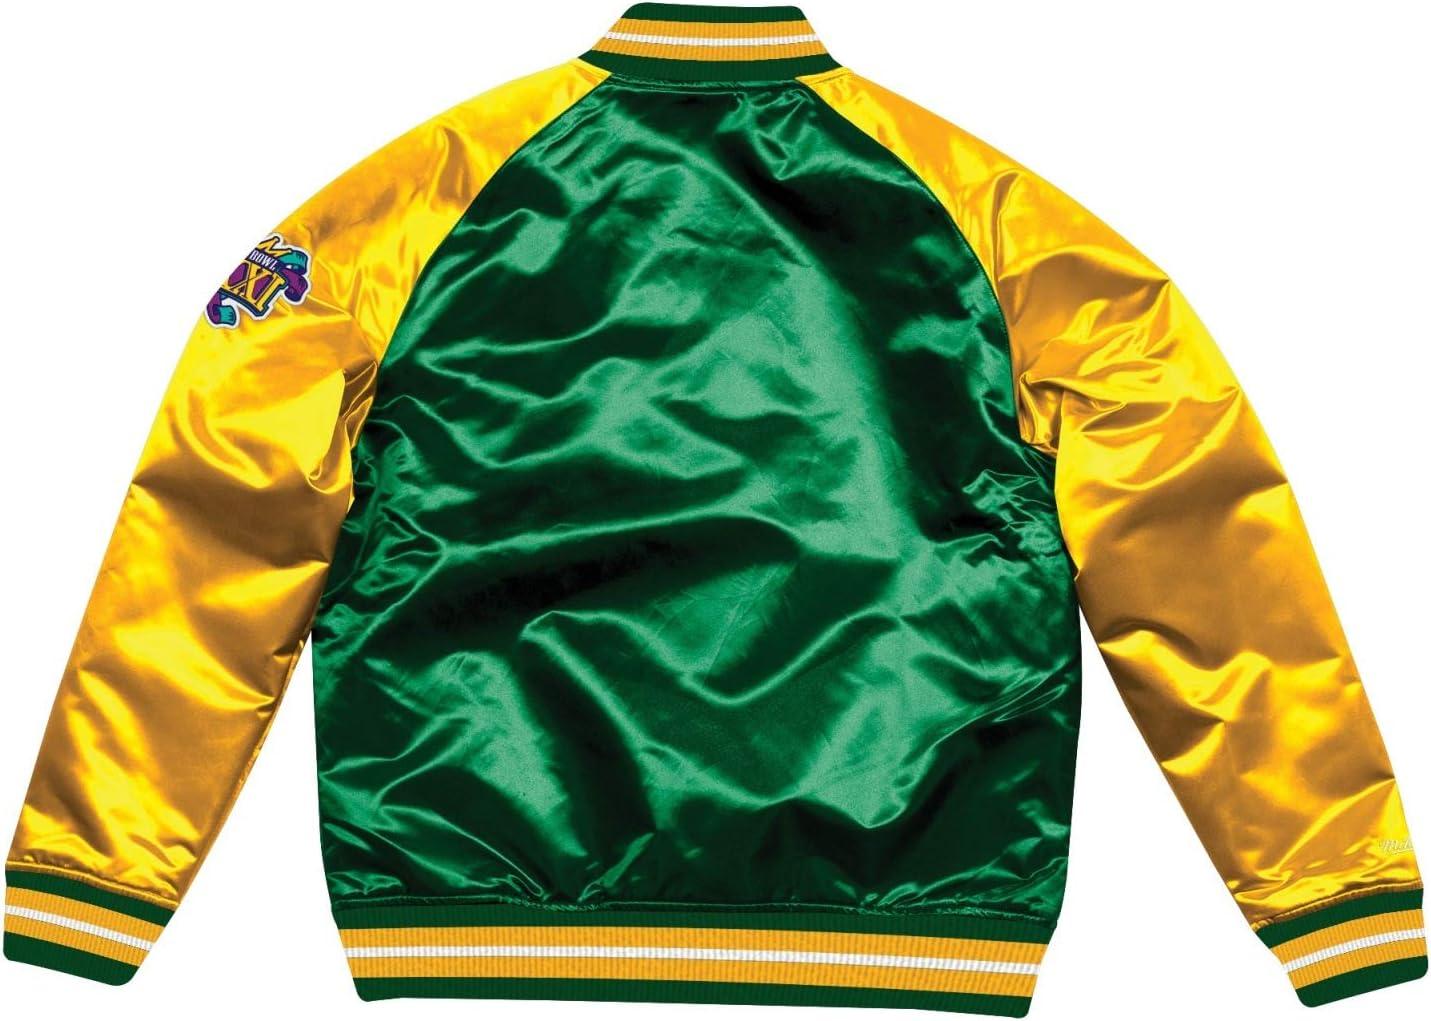 Mitchell /& Ness Green Bay Packers NFL Tough Season Premium Satin Jacket